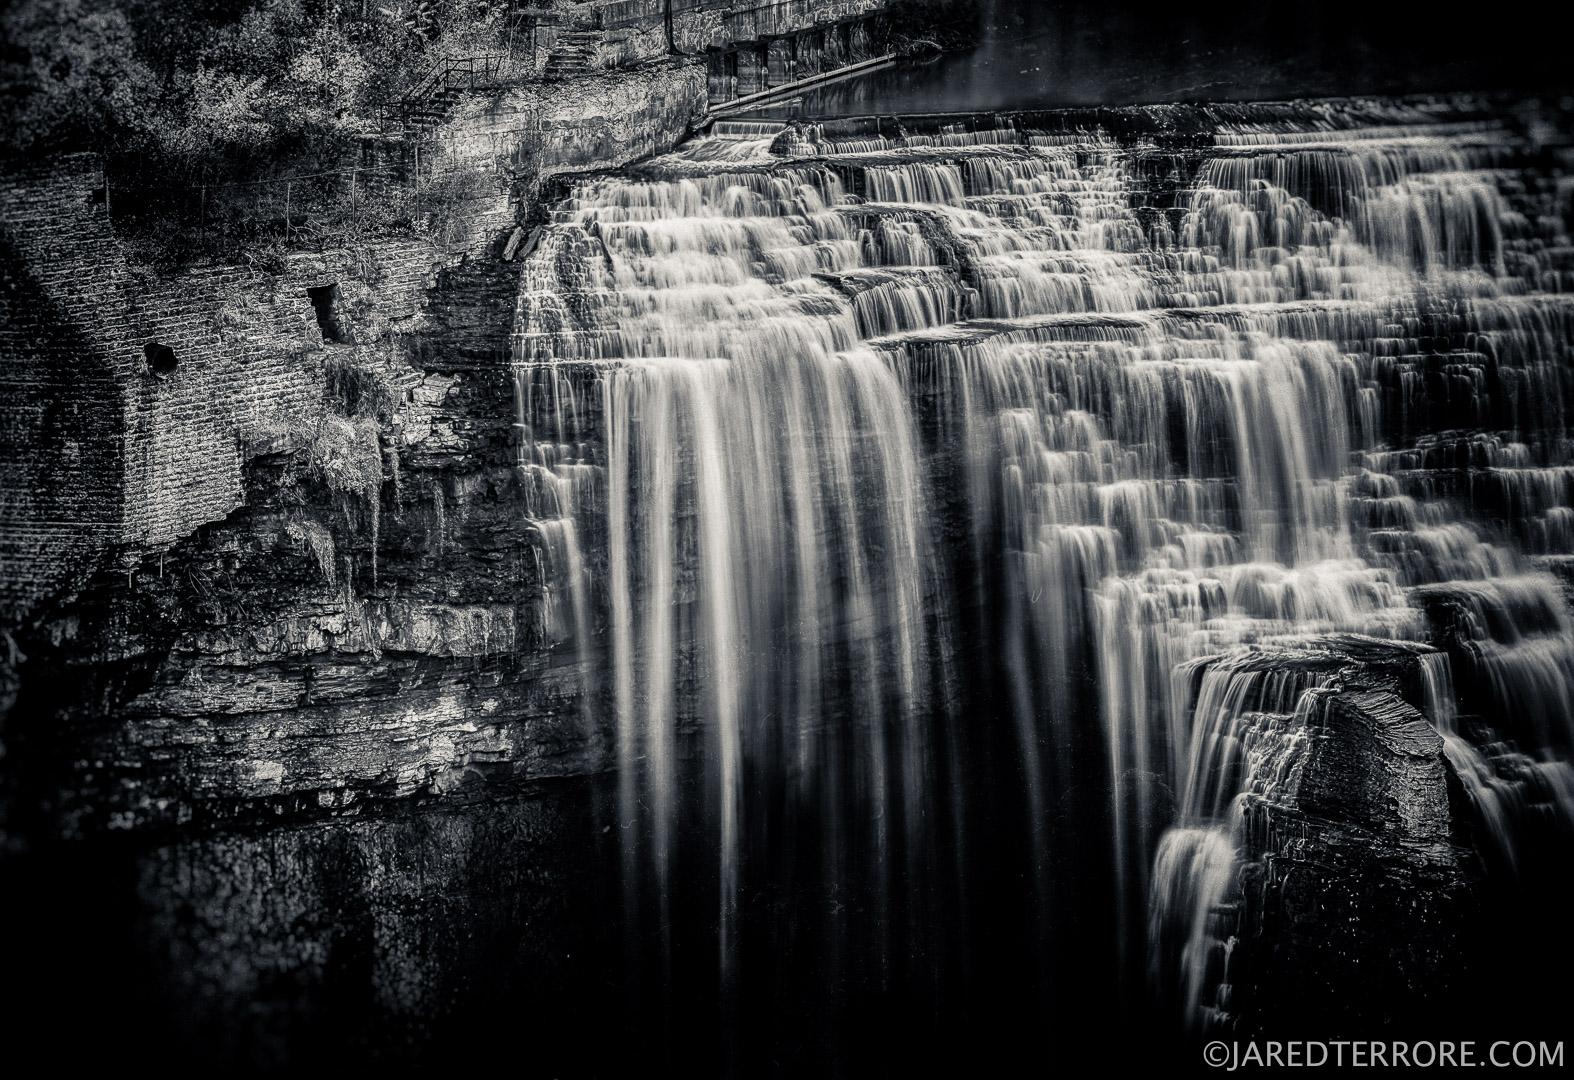 Lower Falls: Interpreted